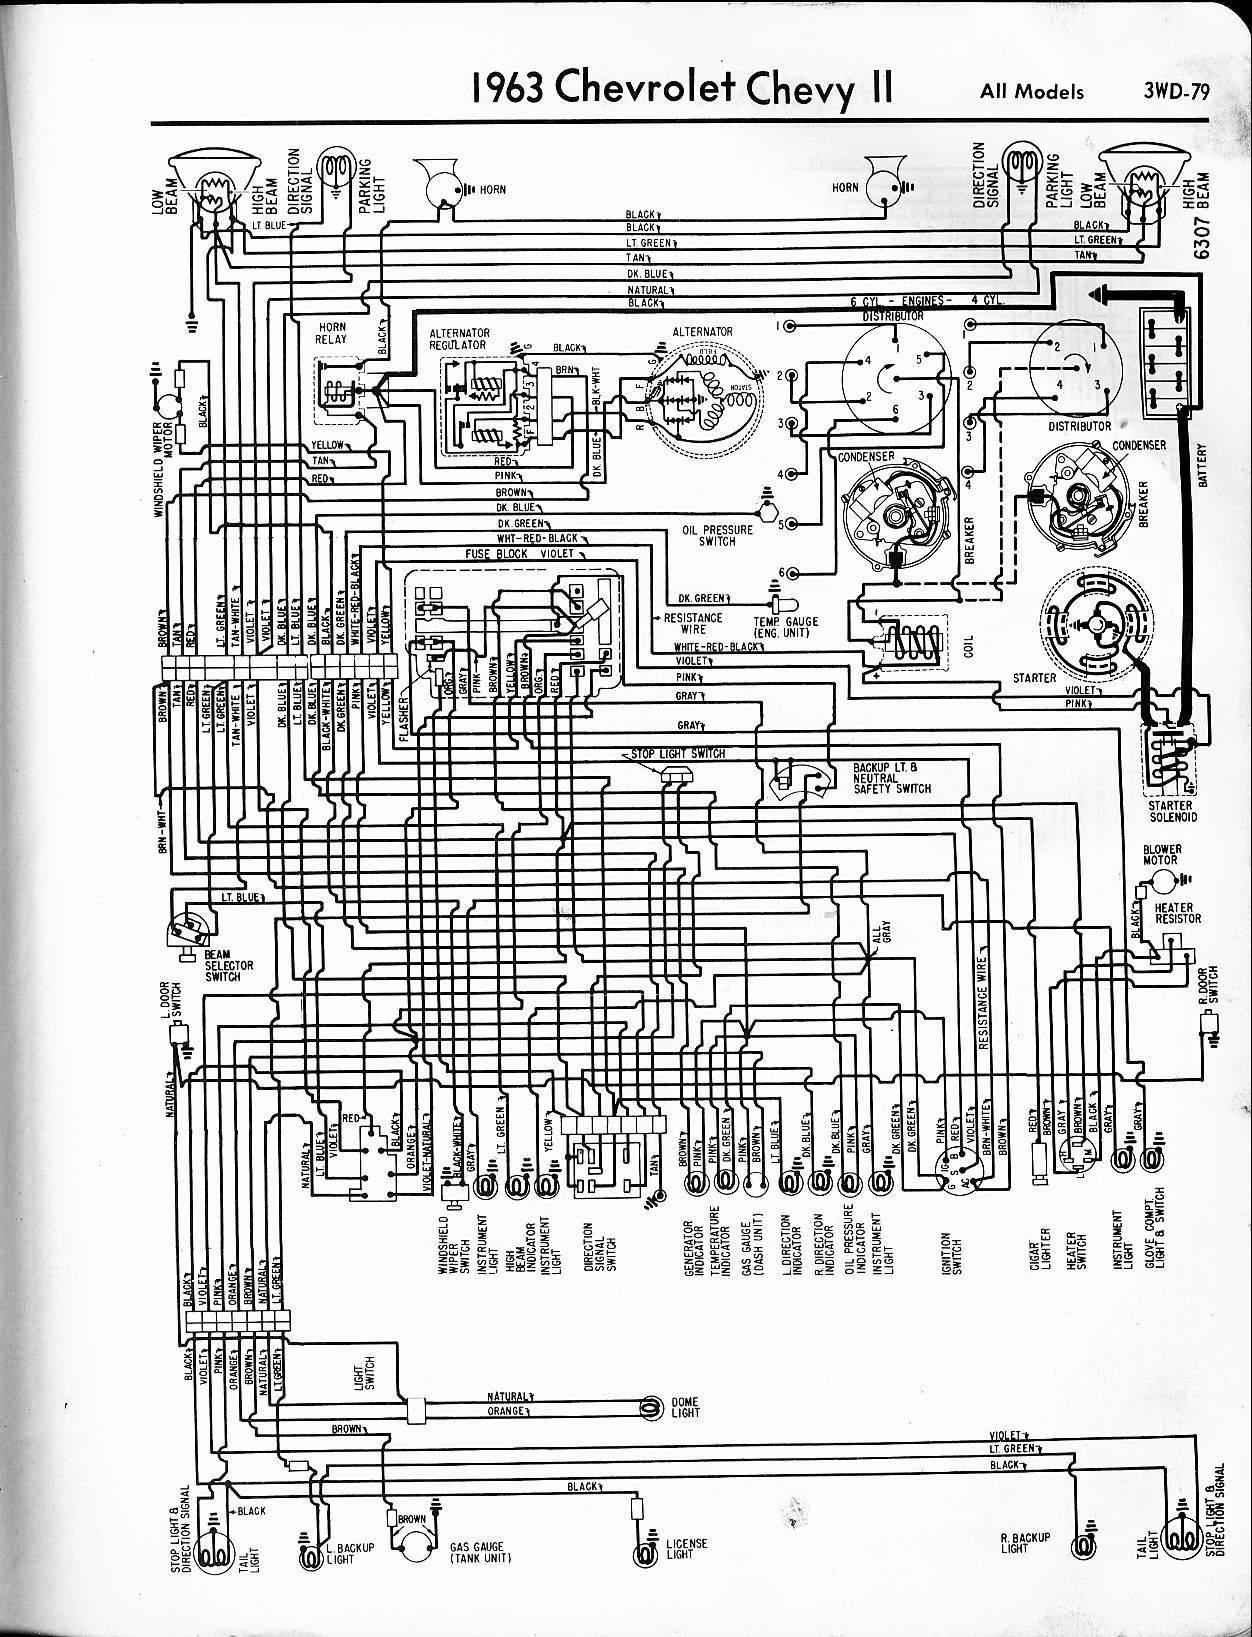 1979 corvette wiring harness free download diagram schematic bl 5130  1231969 dodge wiring diagram free printable schematic  wiring diagram free printable schematic